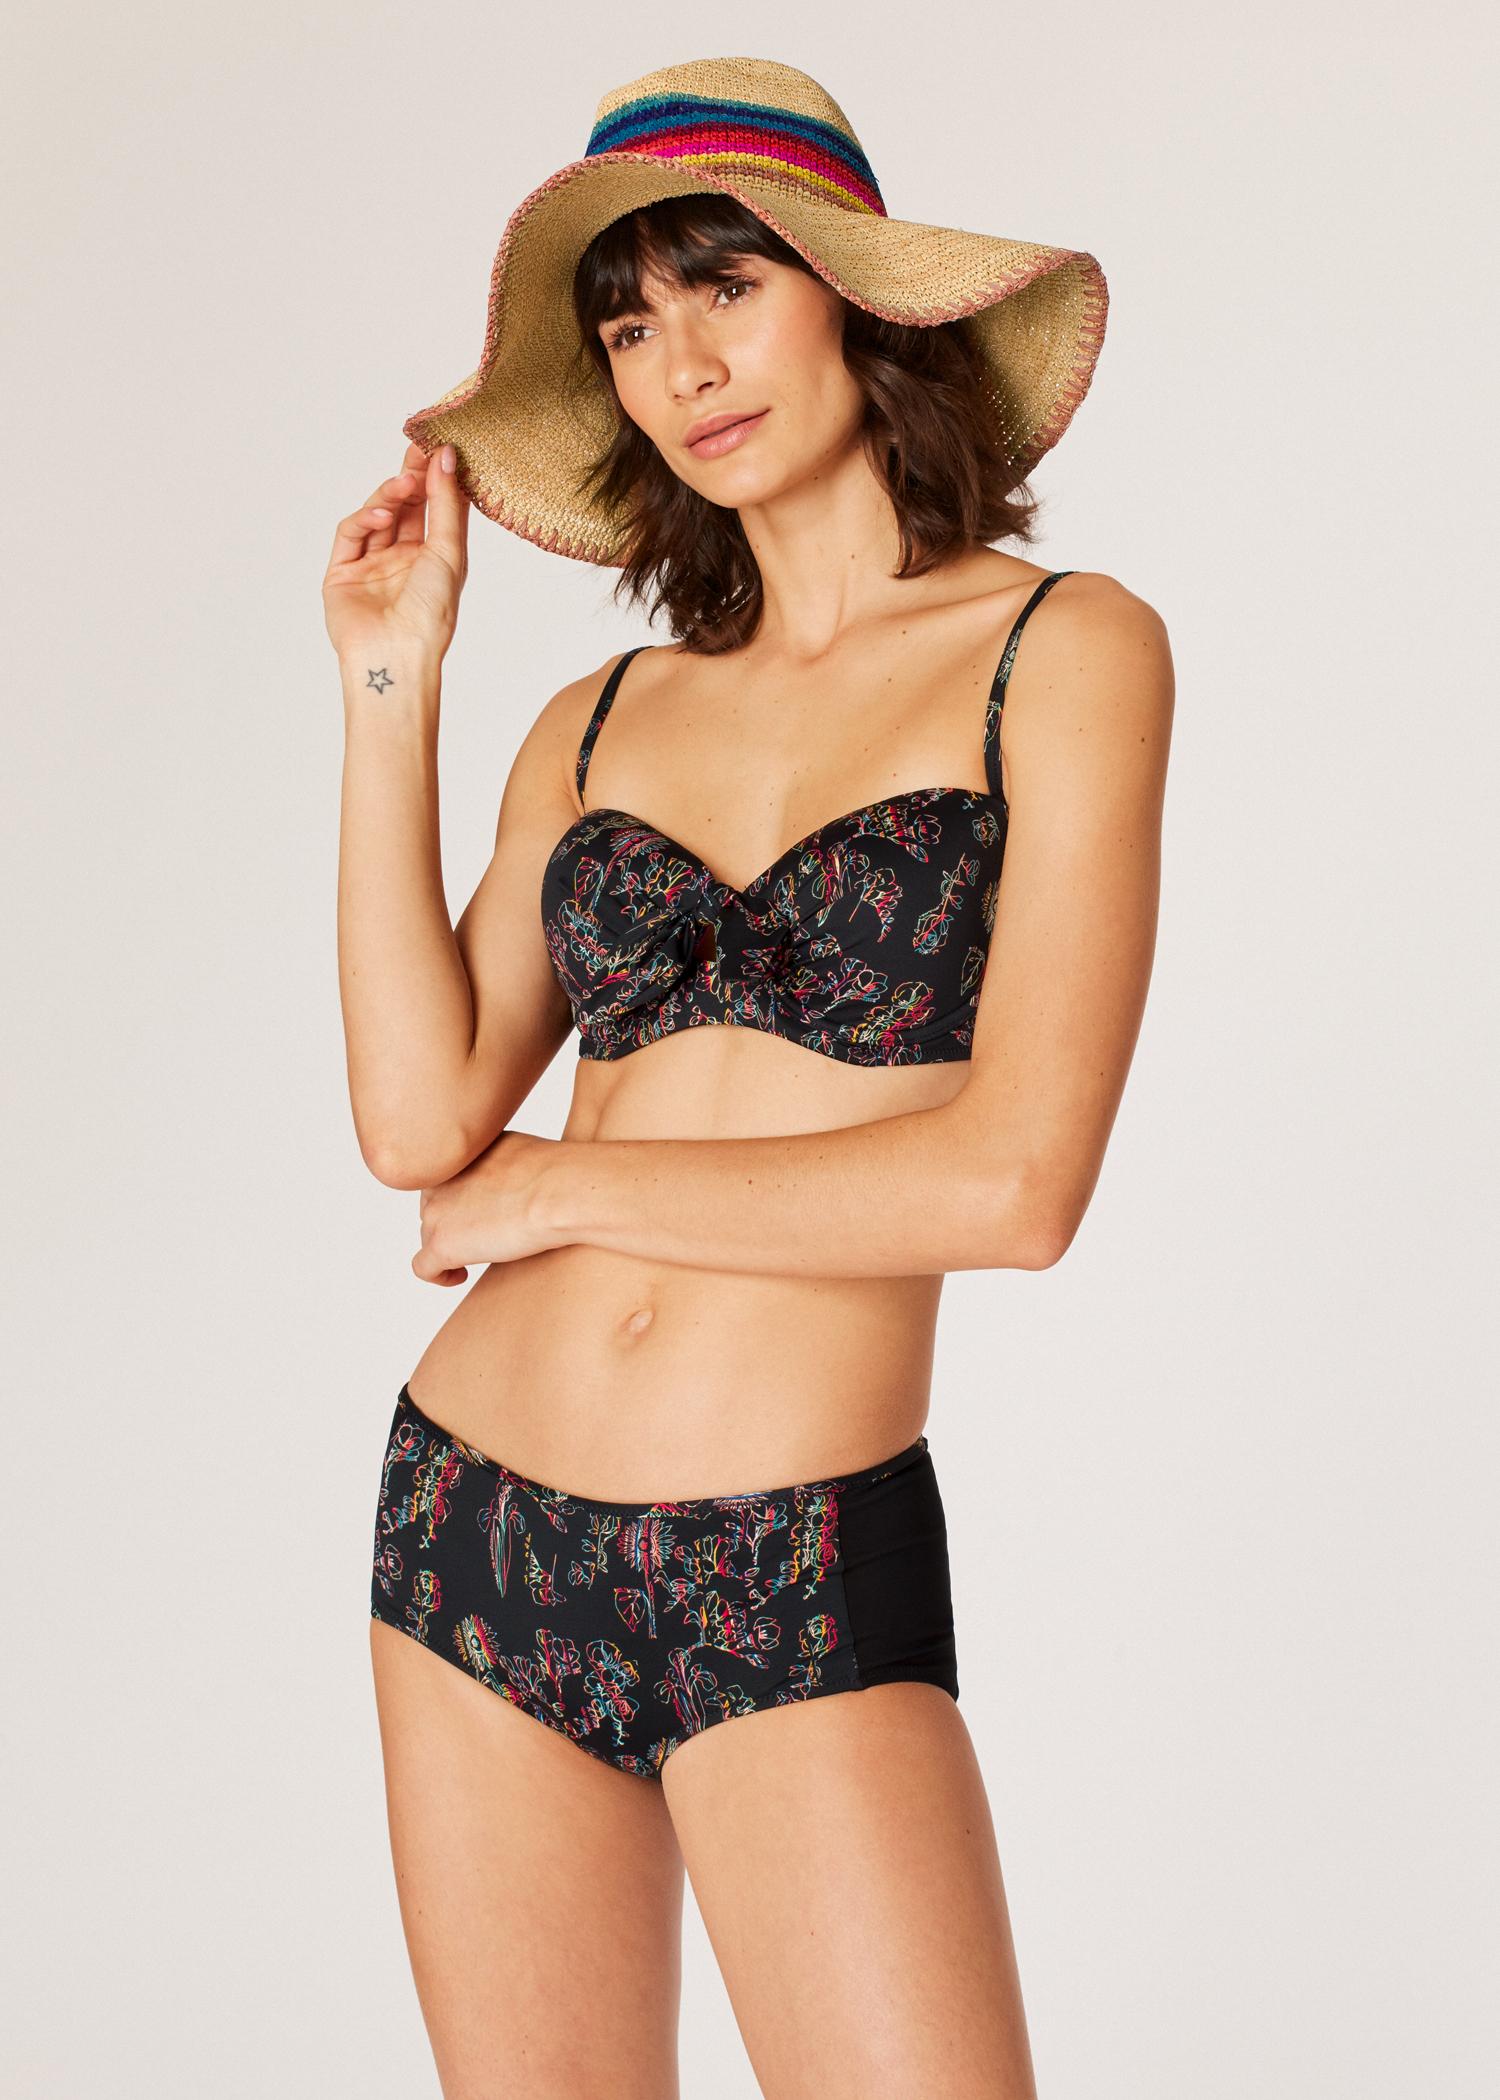 bec46ab5dd0 Model front close up - Women's 'Floral Swirl' Print Bandeau Bikini Top ...